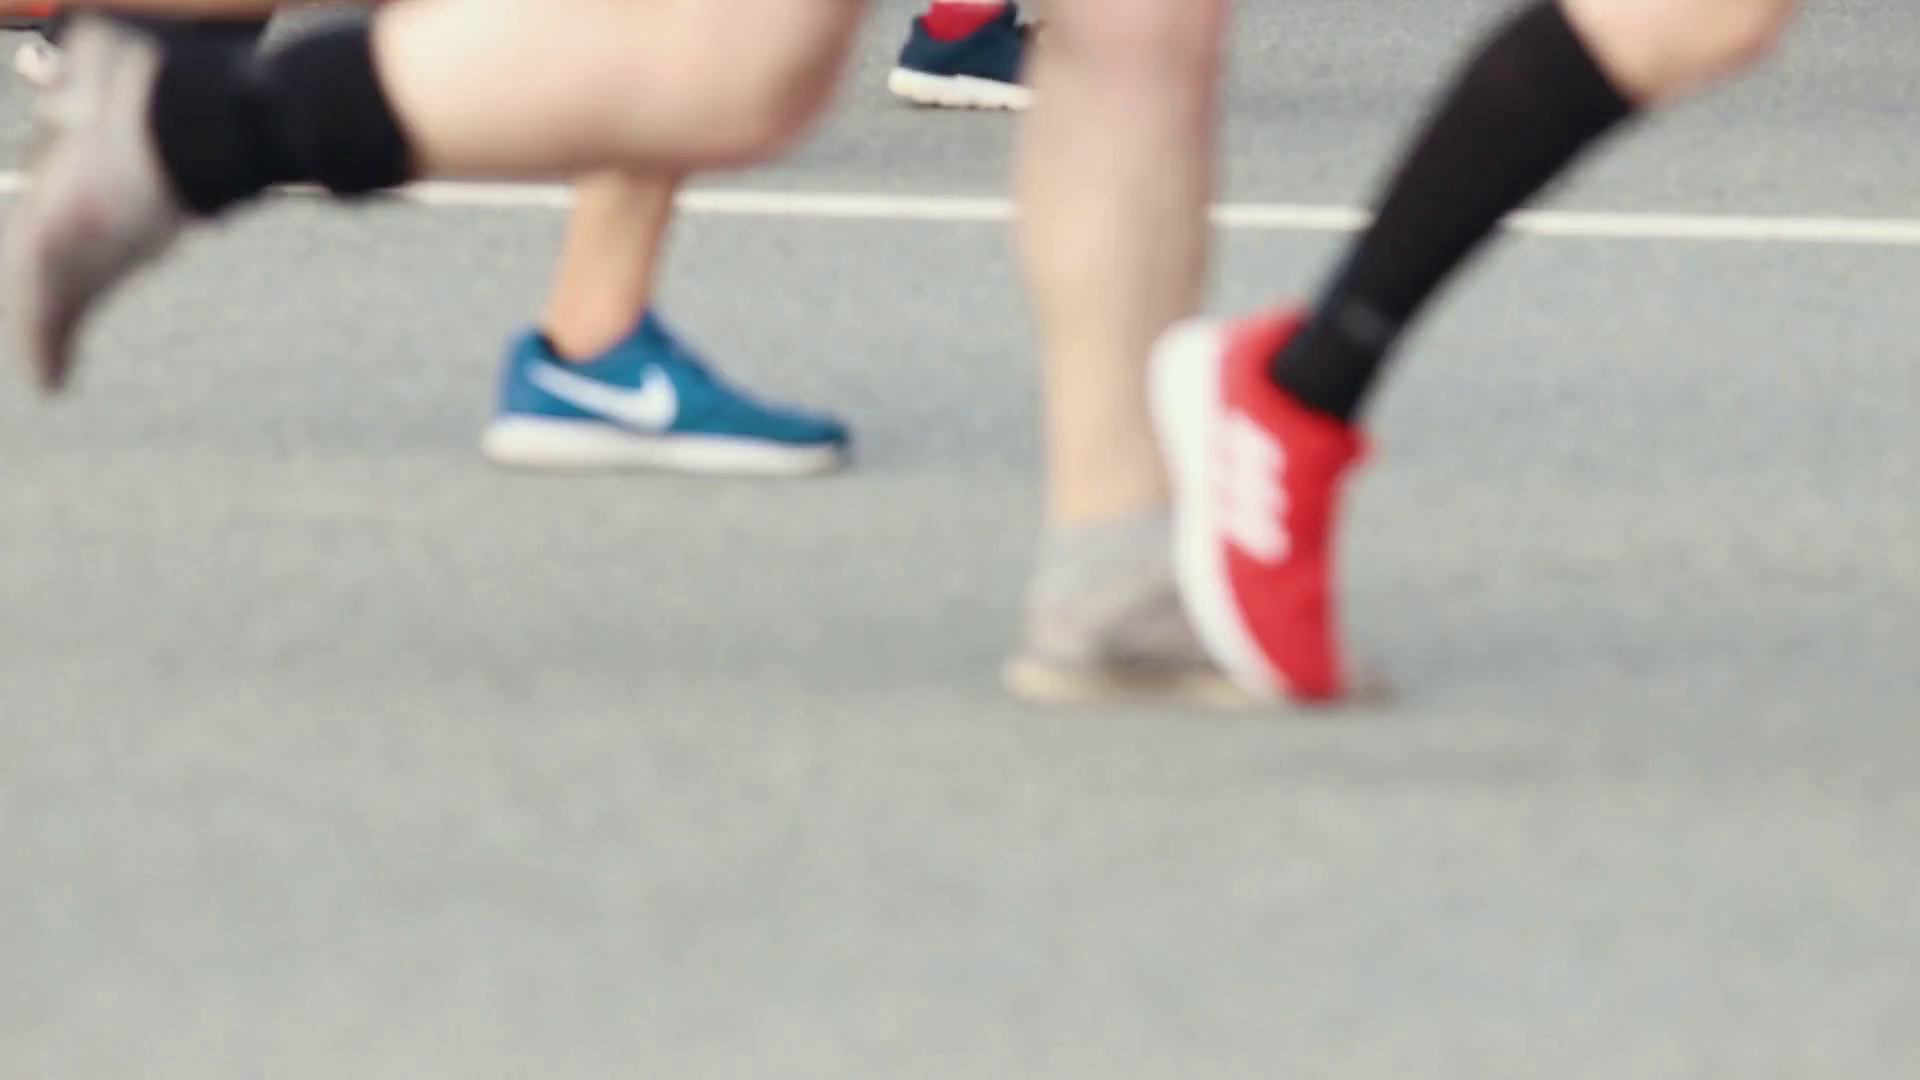 05-05-2019 RUSSIA, KAZAN: A running marathon. Feet of the ...